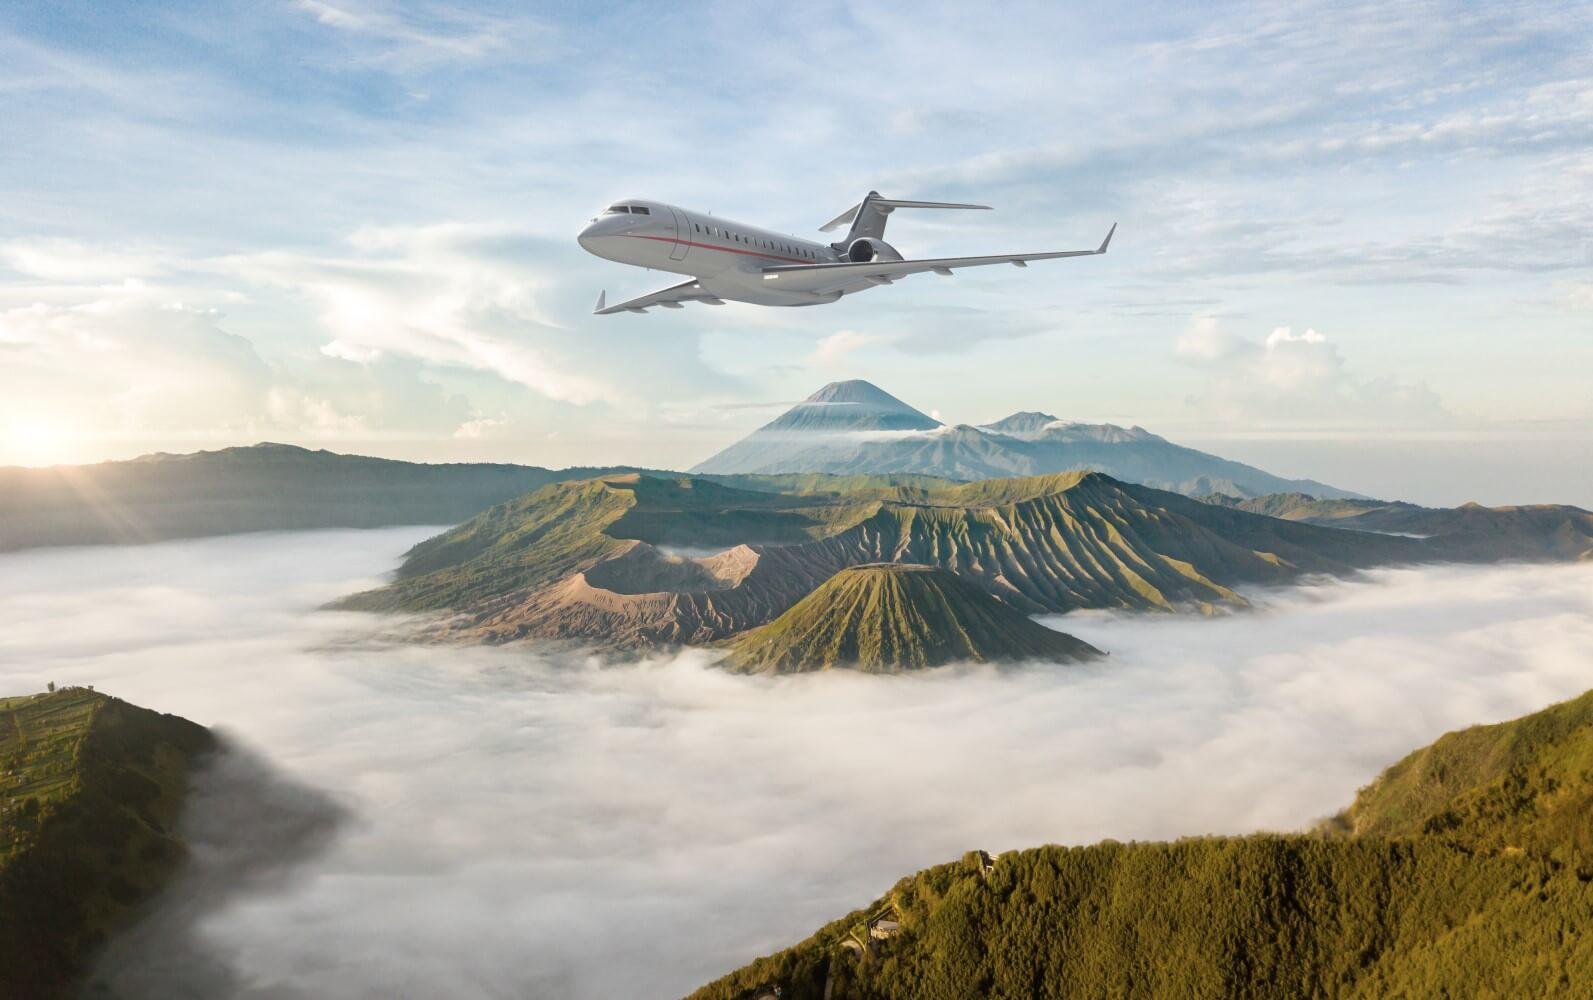 Vista Jet フライトイメージ